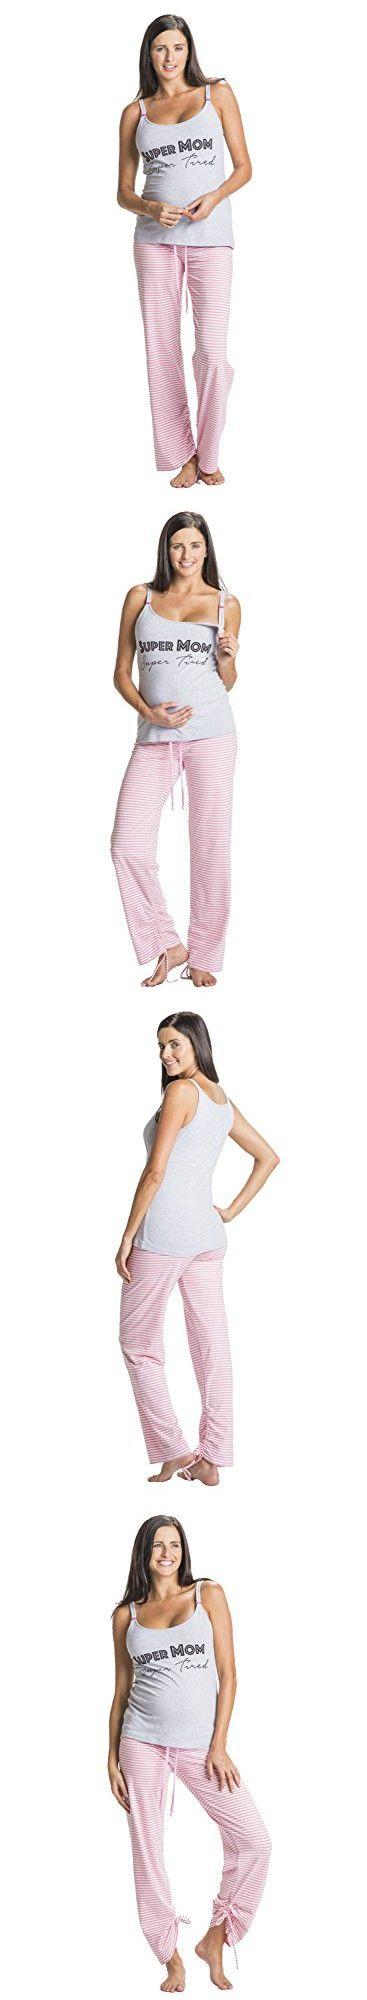 You! Lingerie Super Mom Super Tired Maternity Nursing Pajamas Set (X-Large, Grey)